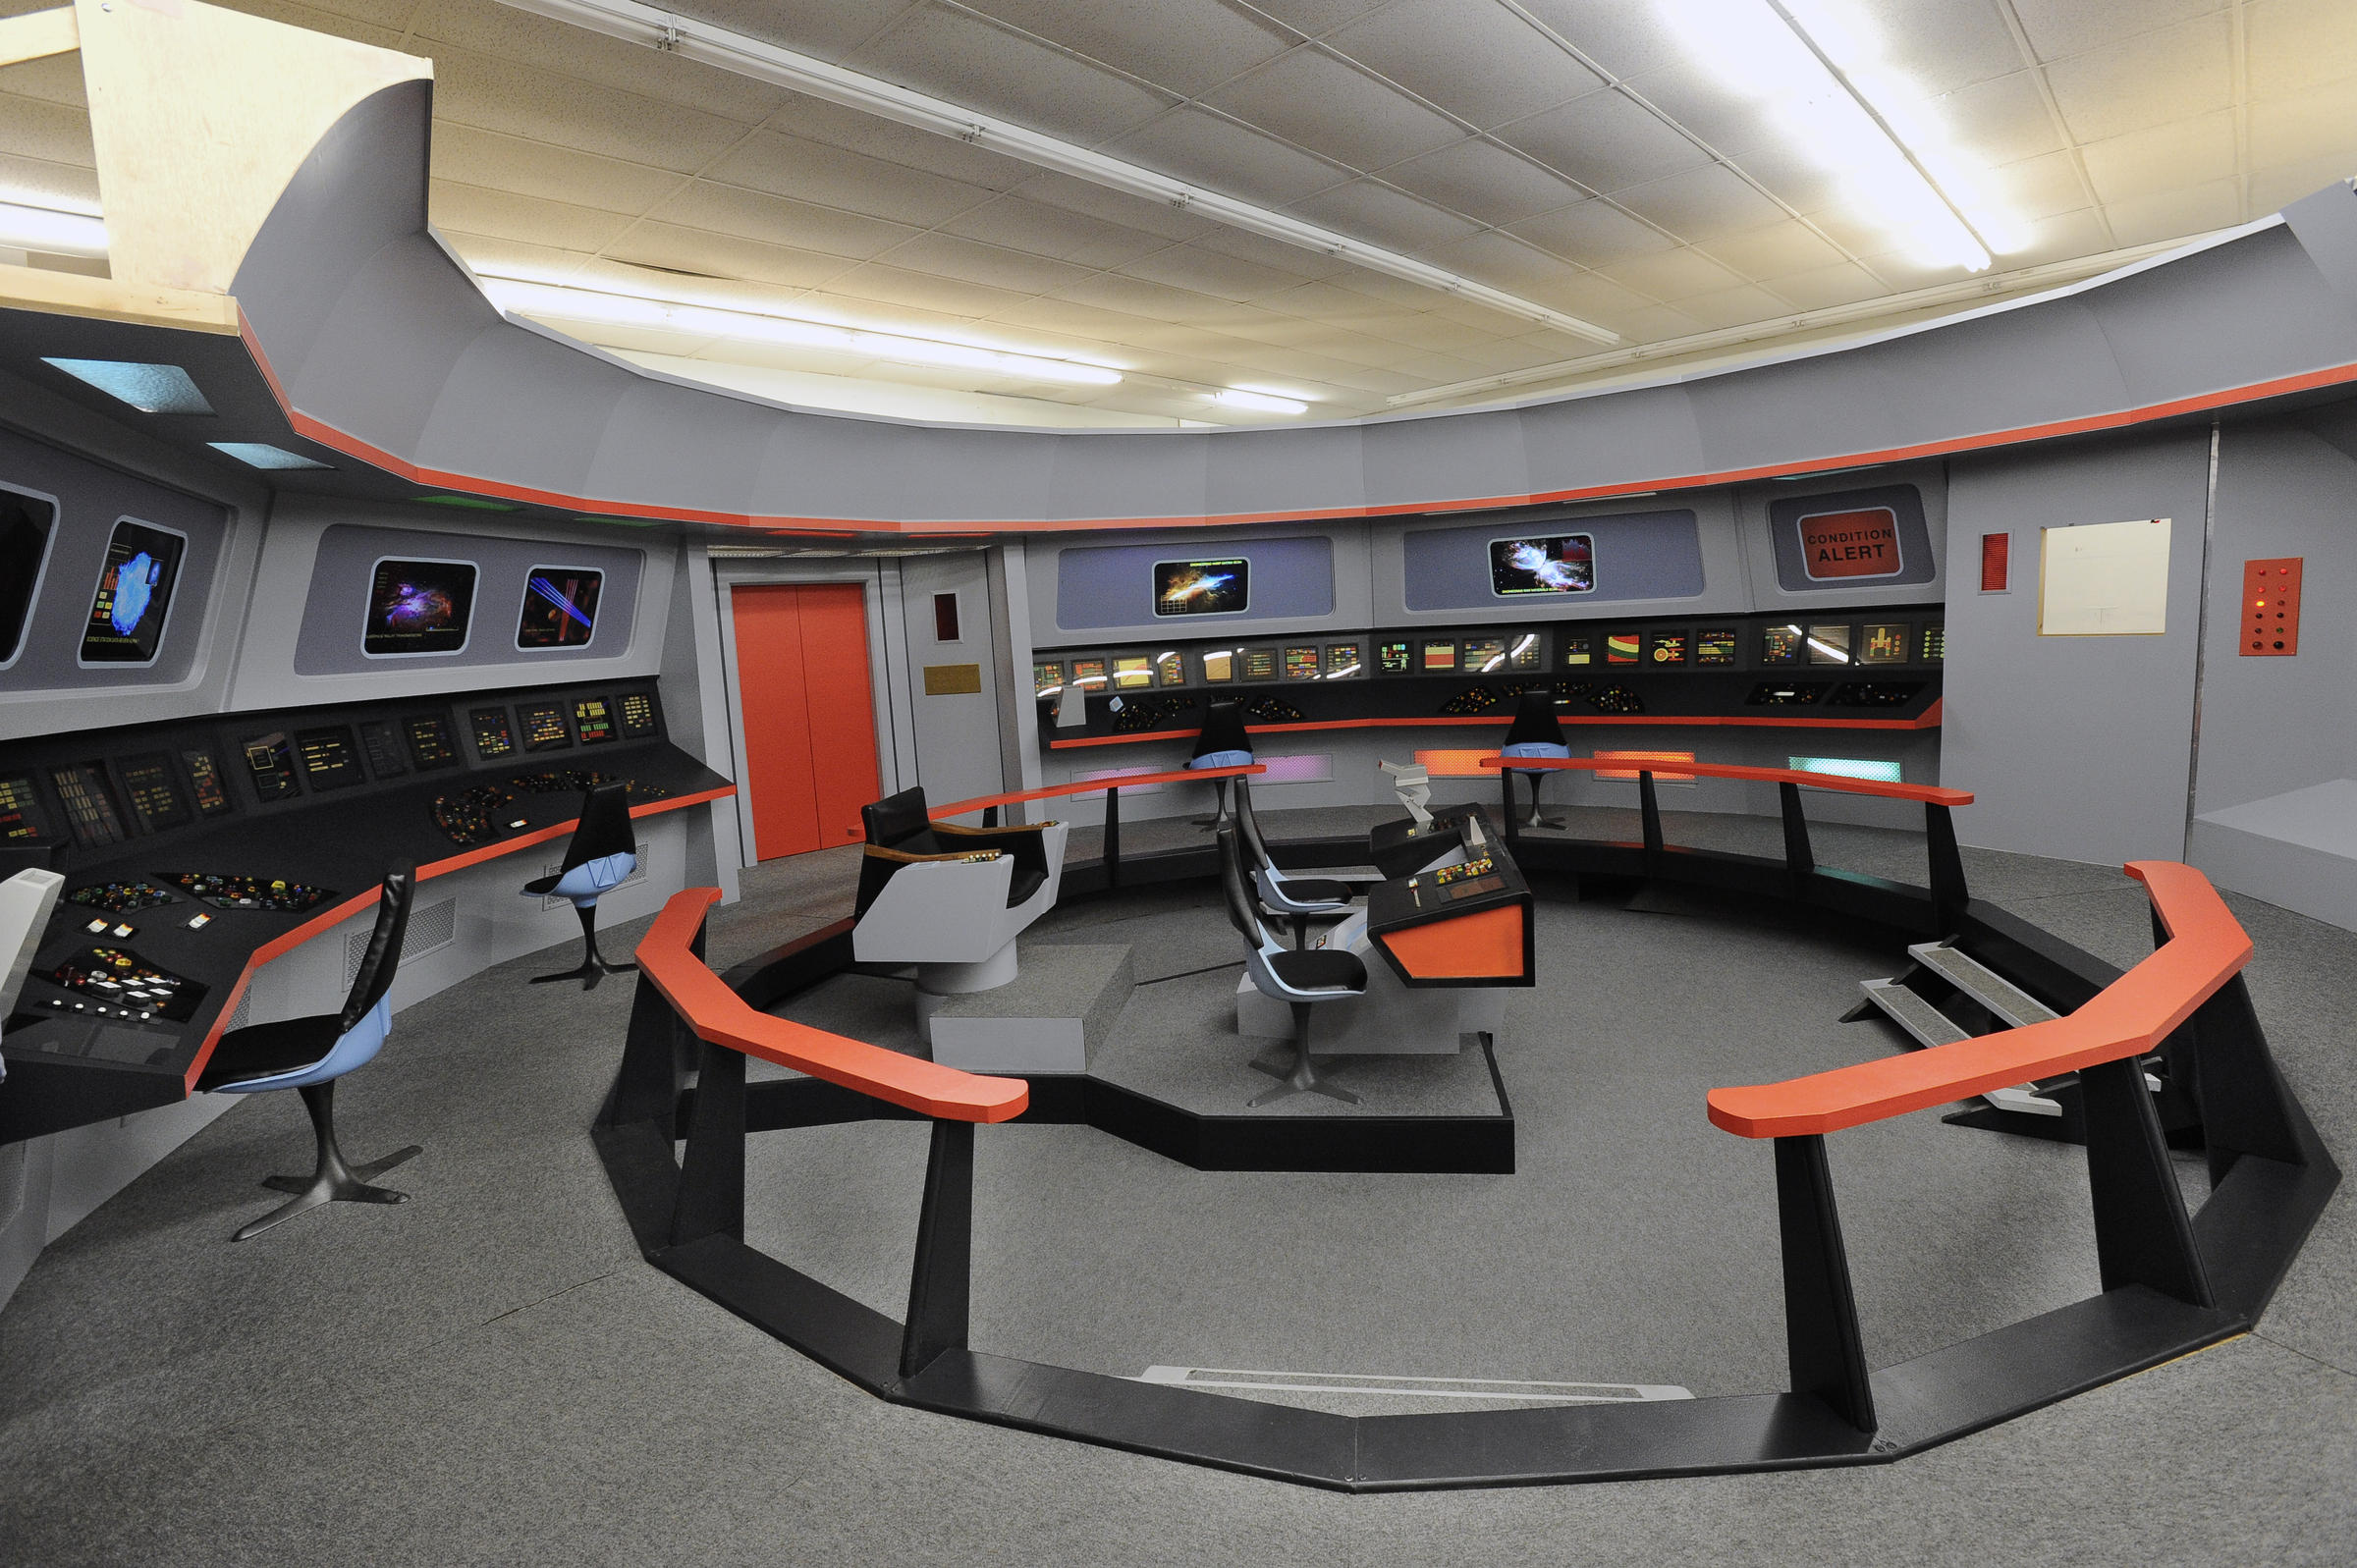 Home Design Online Programs Star Trek Set Replica Gets Permanent Home In Ticonderoga